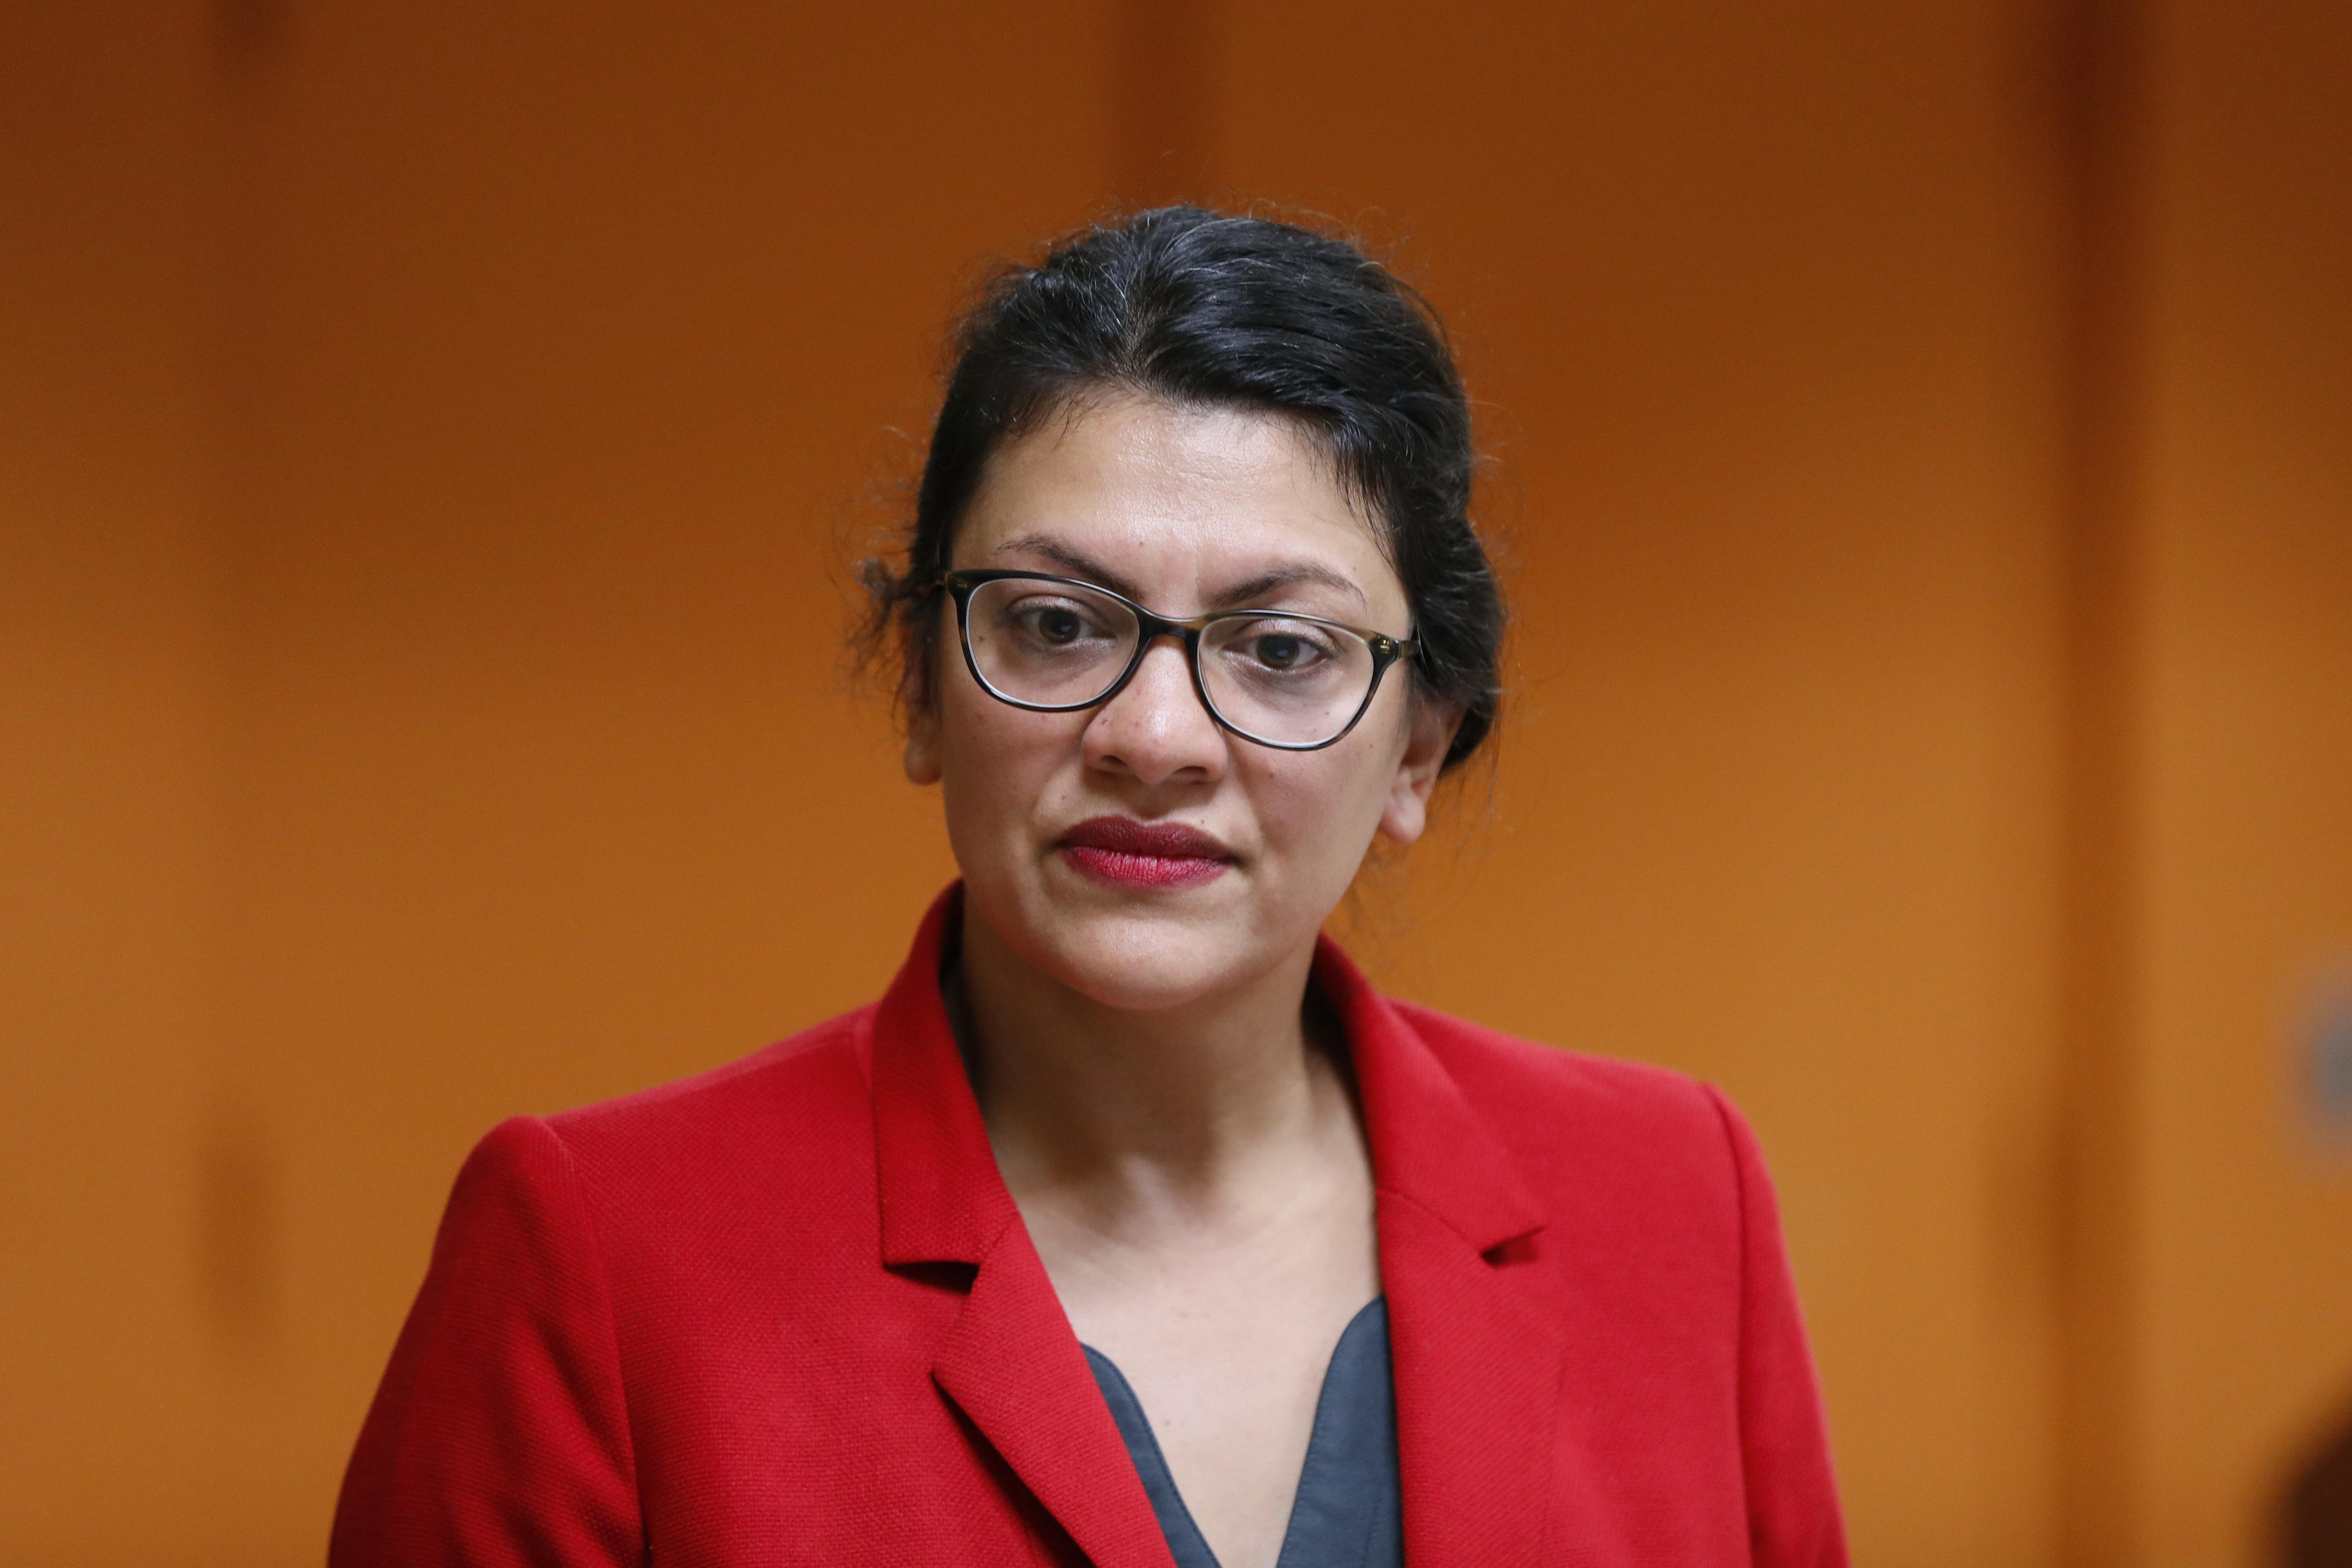 Rep. Rashida Tlaib is granted visit to West Bank.